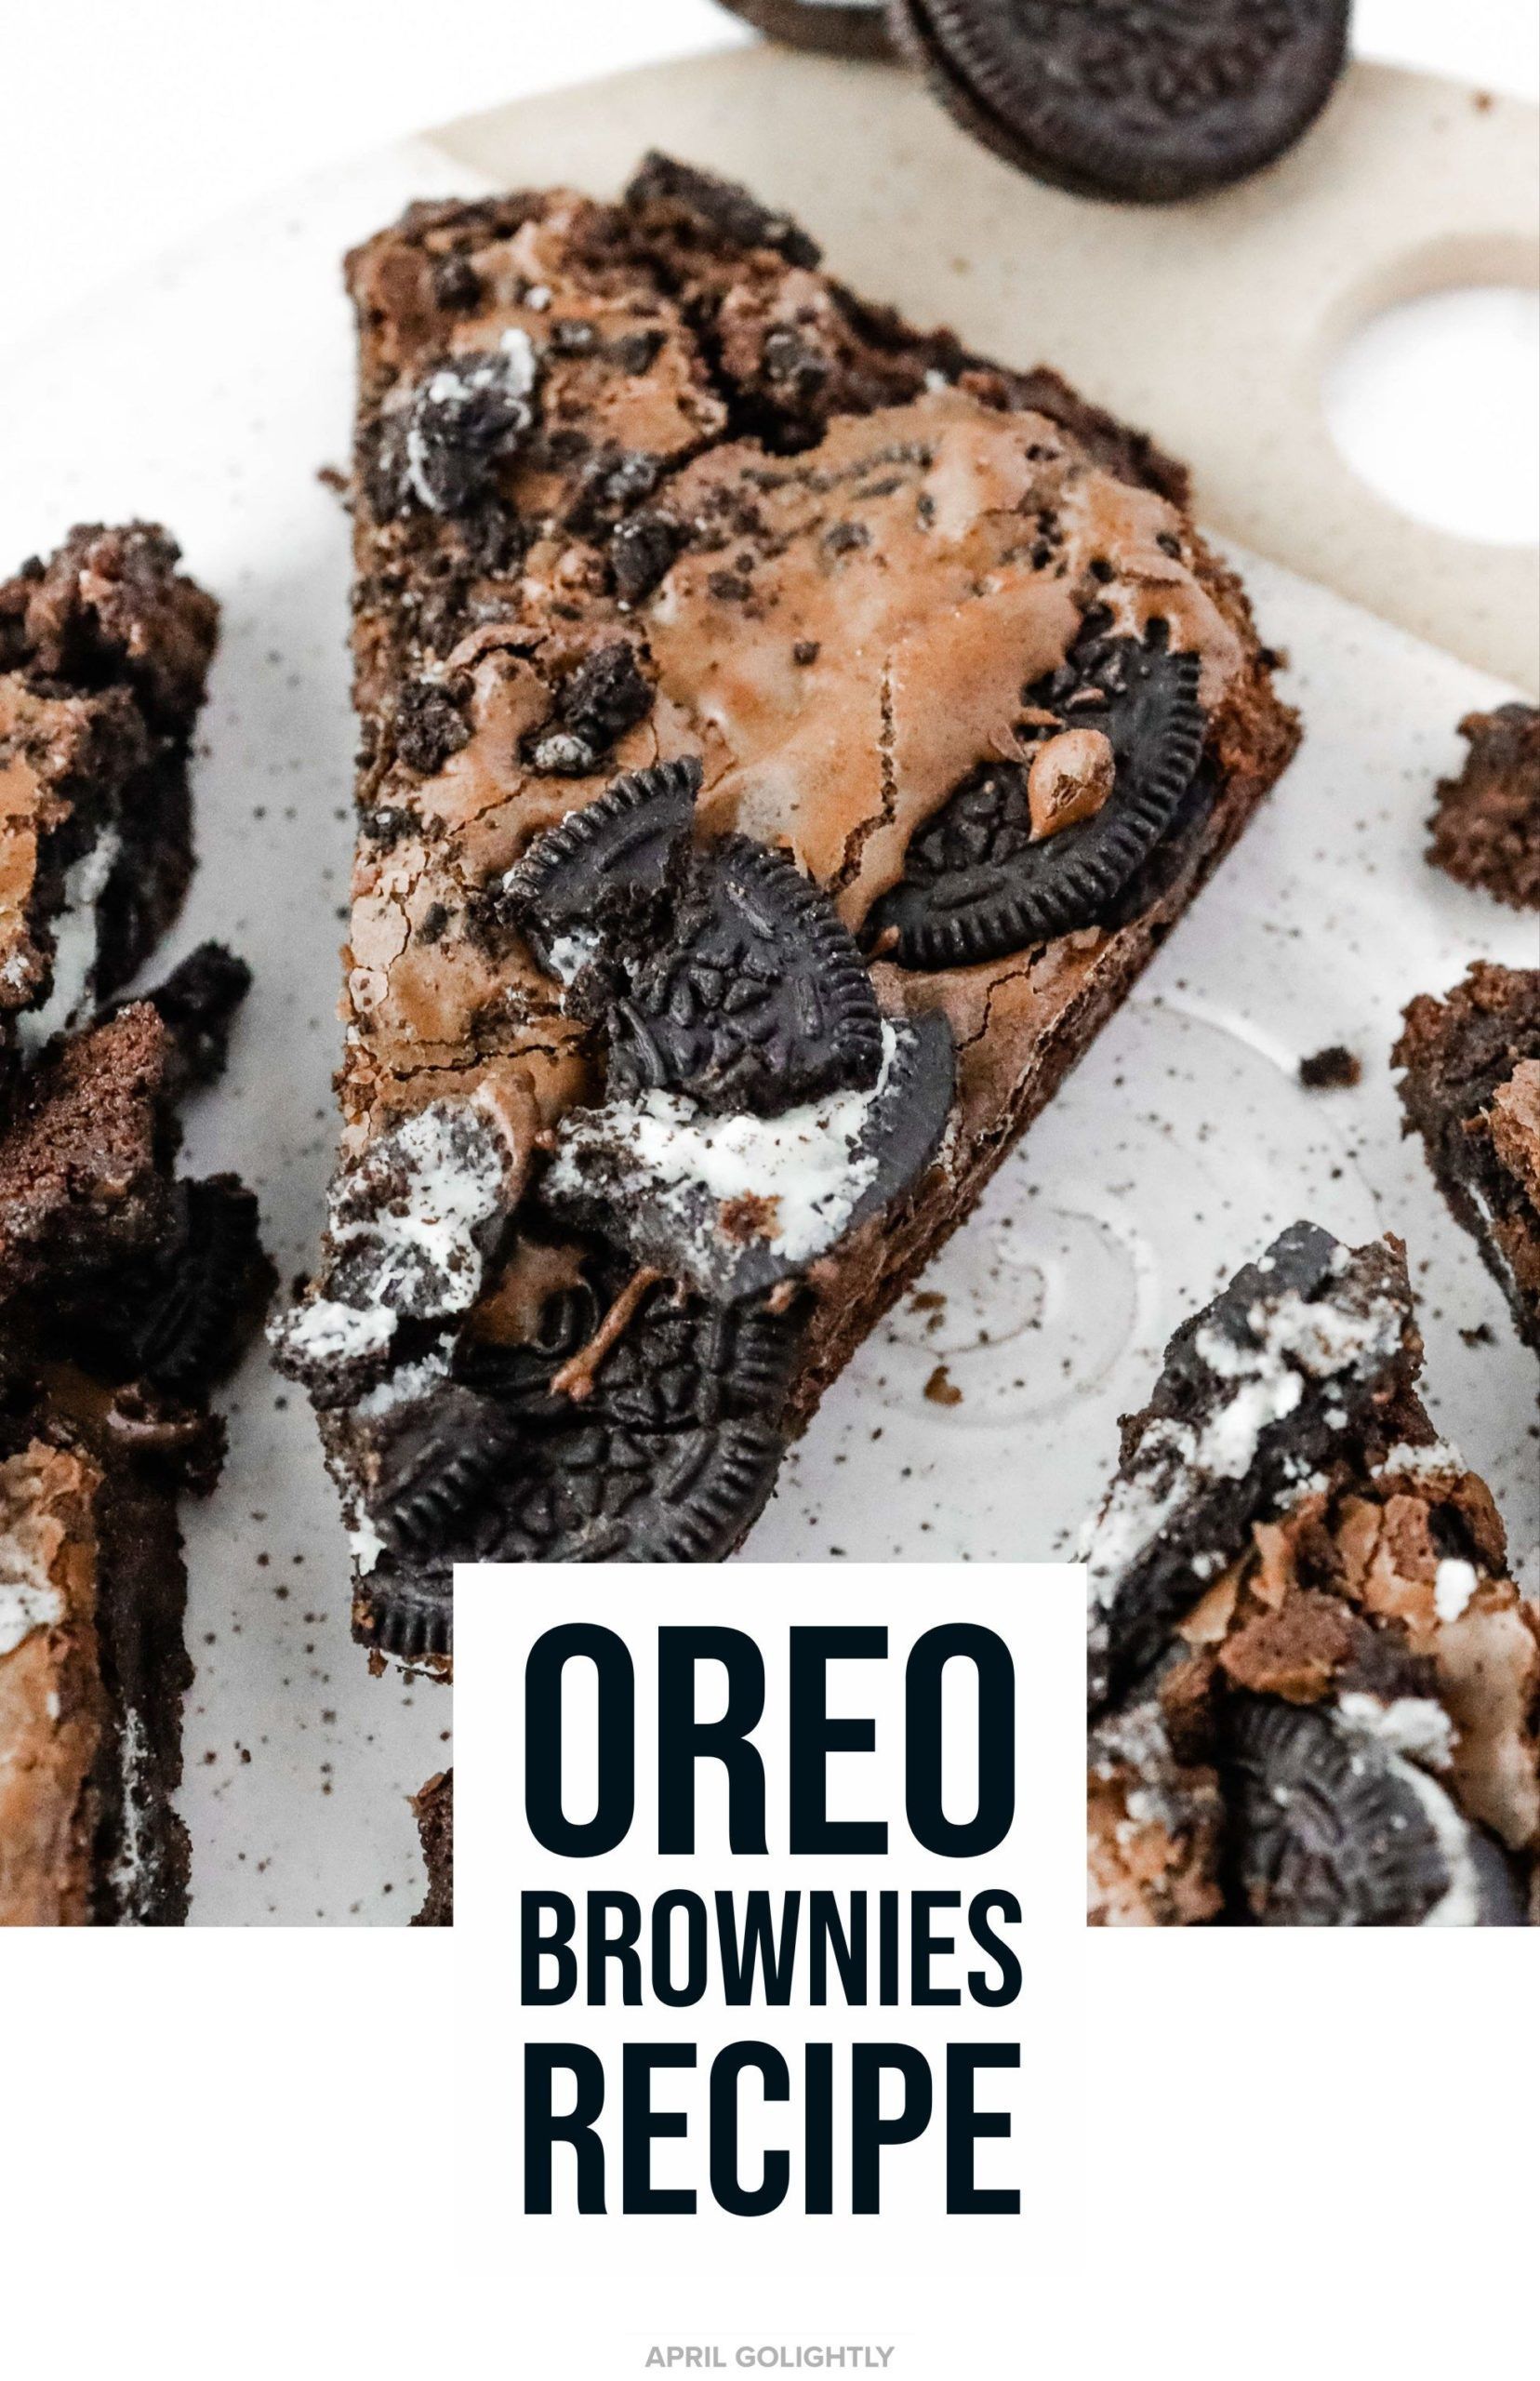 Reichhaltige Schokolade OREO Brownies - Golightly Food Reichhaltige Schokolade OREO Brownies - Goli